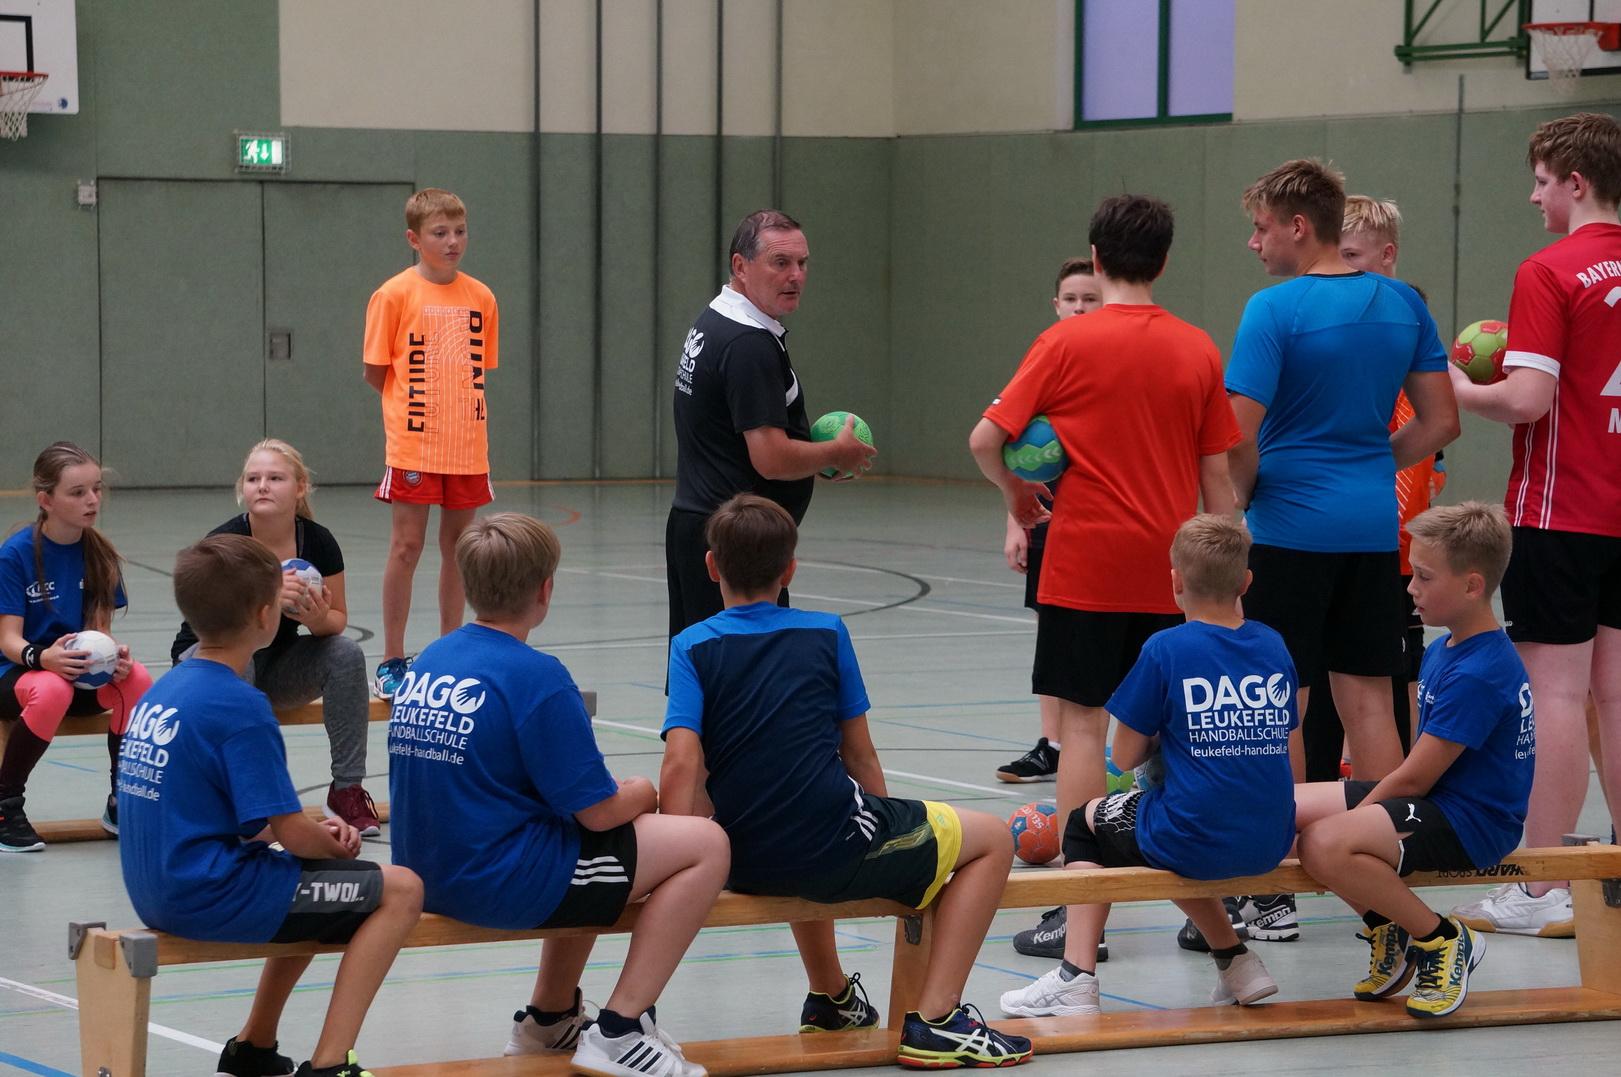 201808_Handballcamp_SDH_MG_164w